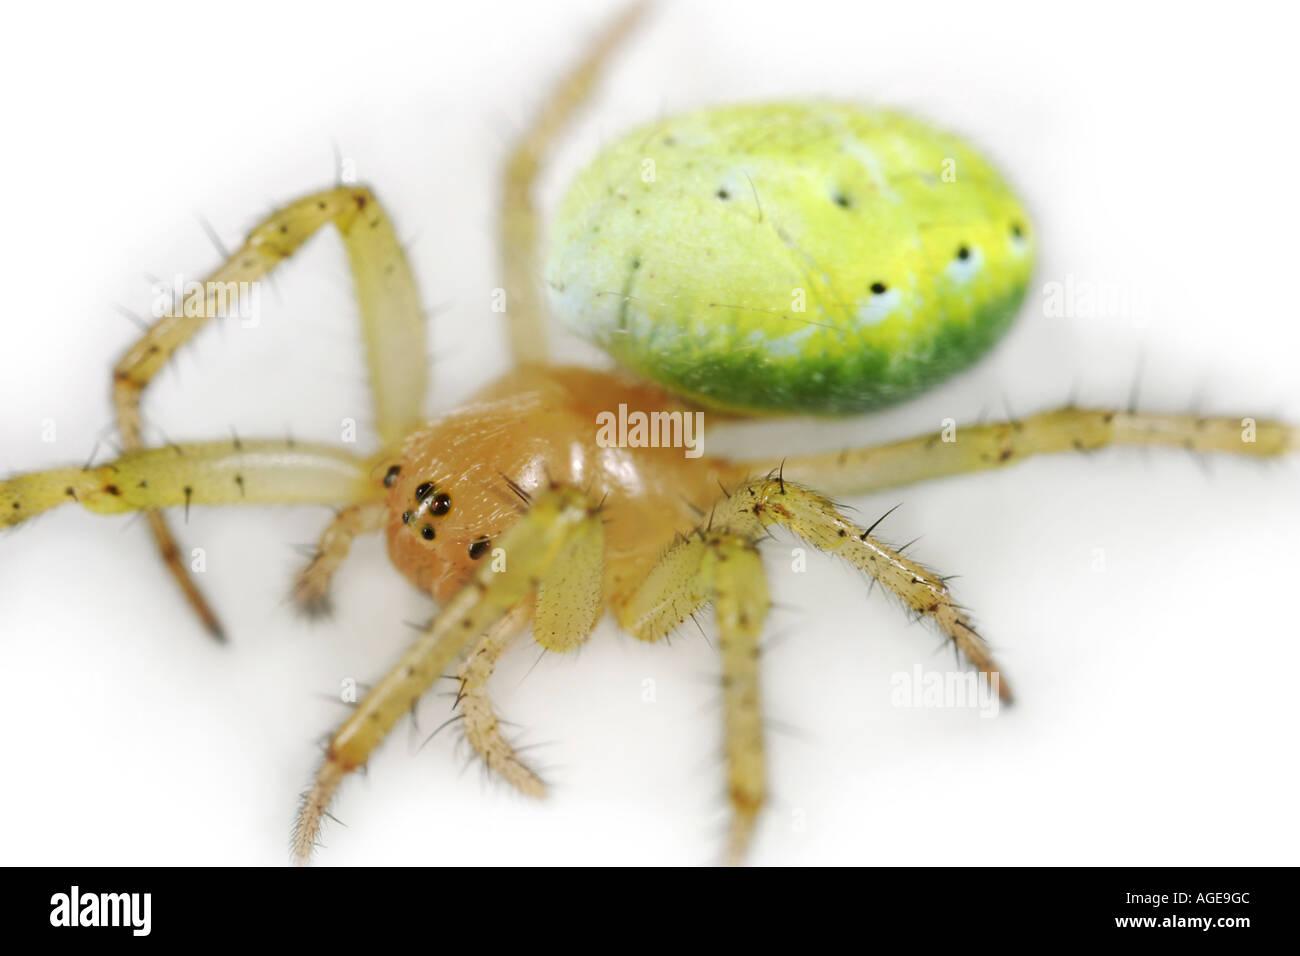 Cucumber Spider, Araniella Cucurbitina, on white background Stock Photo